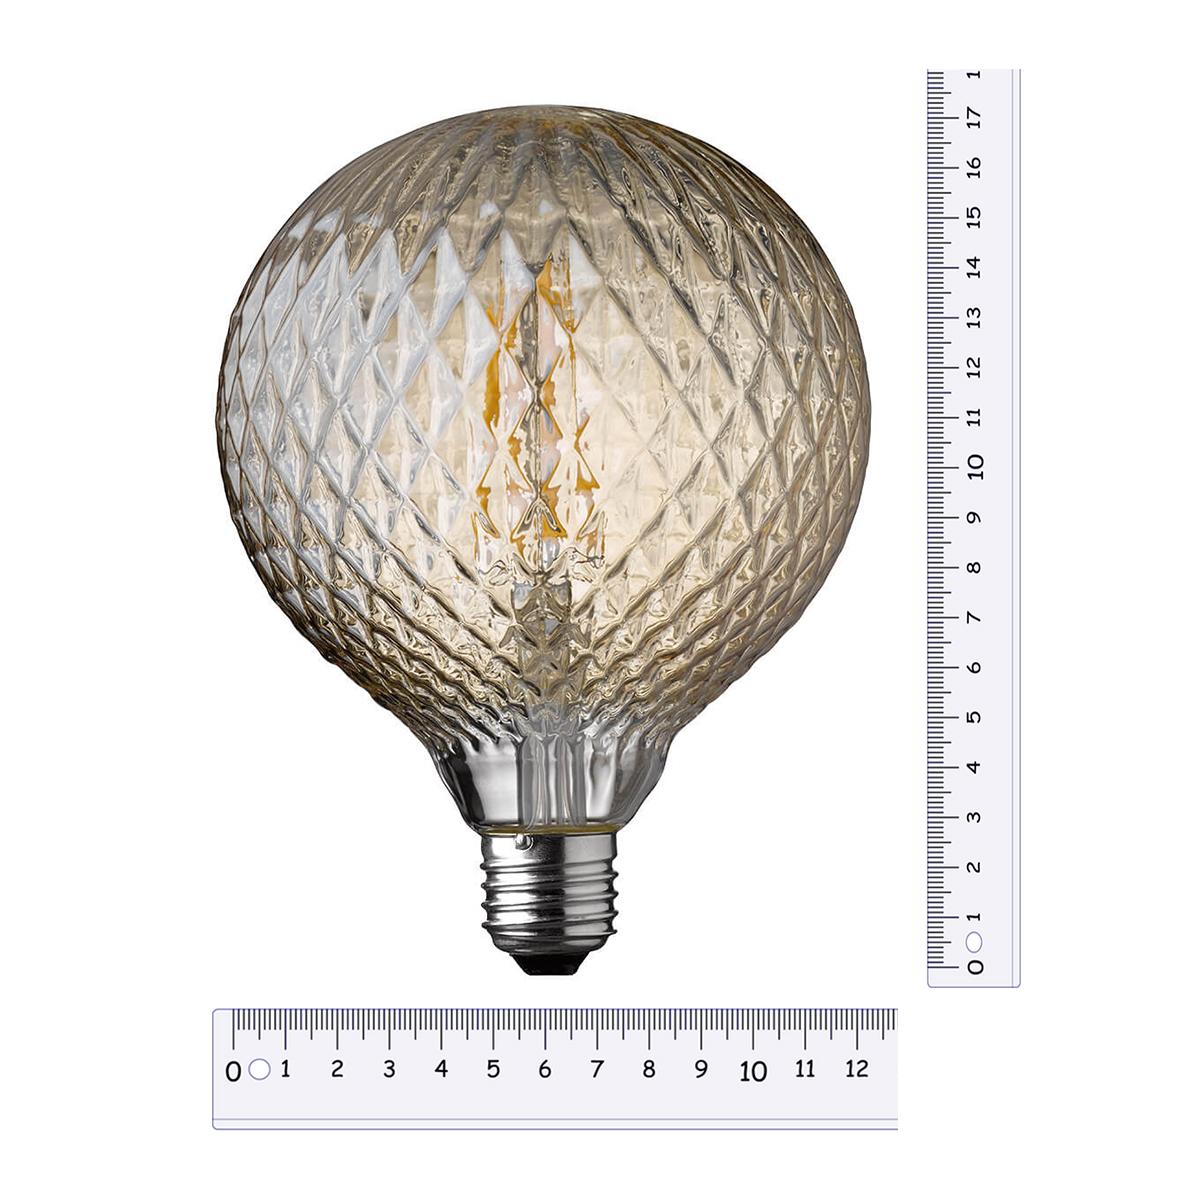 Globe geribbeld getint glas met ruiten LED lamp 4W 300 lumen E27 1800K warm kaarslicht 17,5 cm hoog